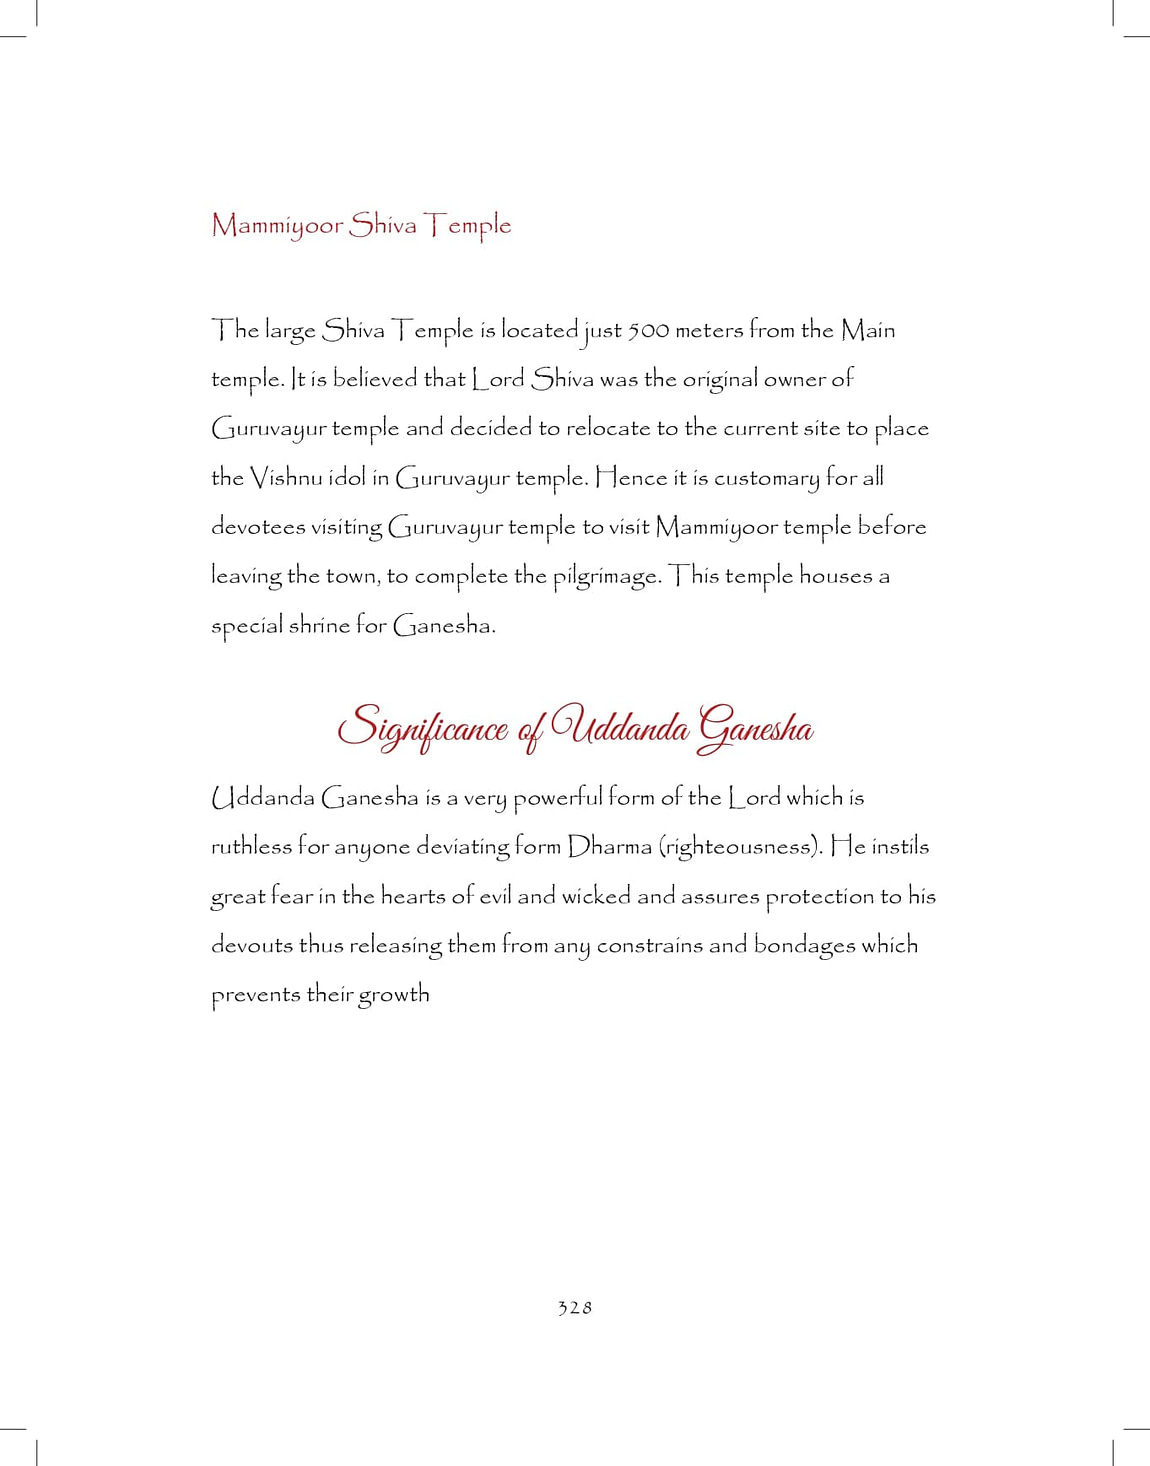 Ganesh-print_pages-to-jpg-0328.jpg